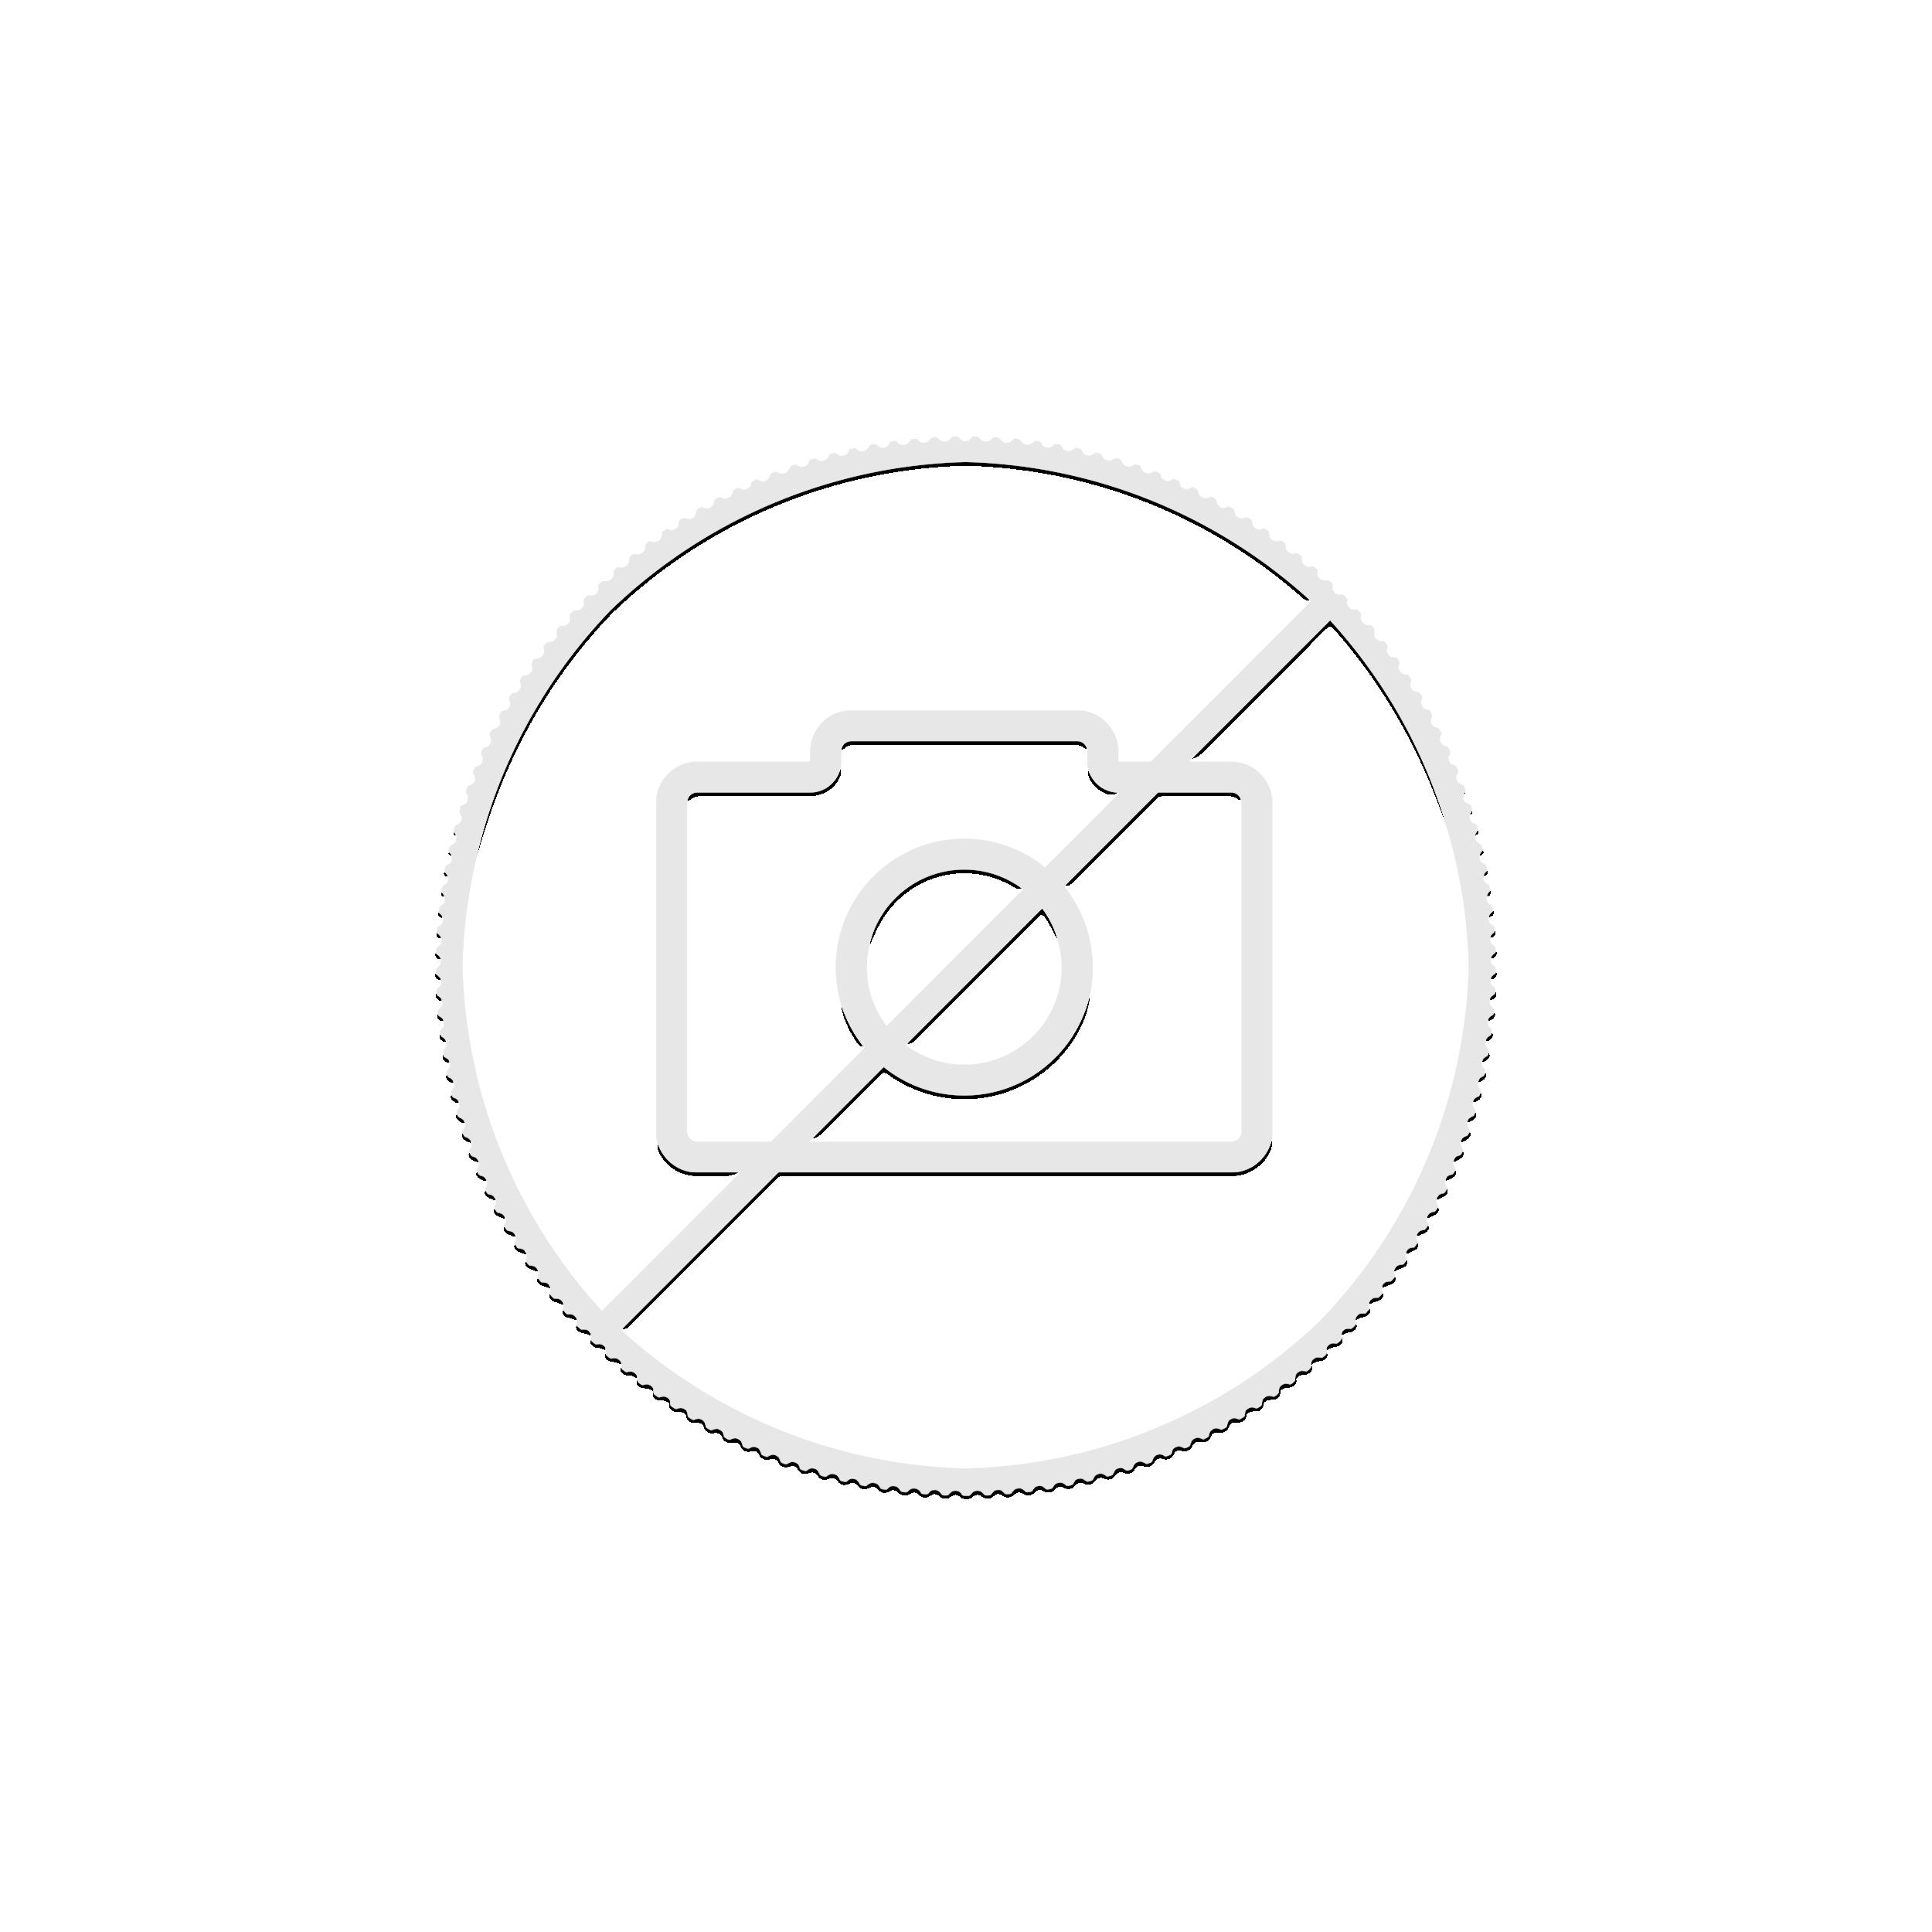 1 Troy ounce zilveren munt Lunar II 2008 zeldzaam